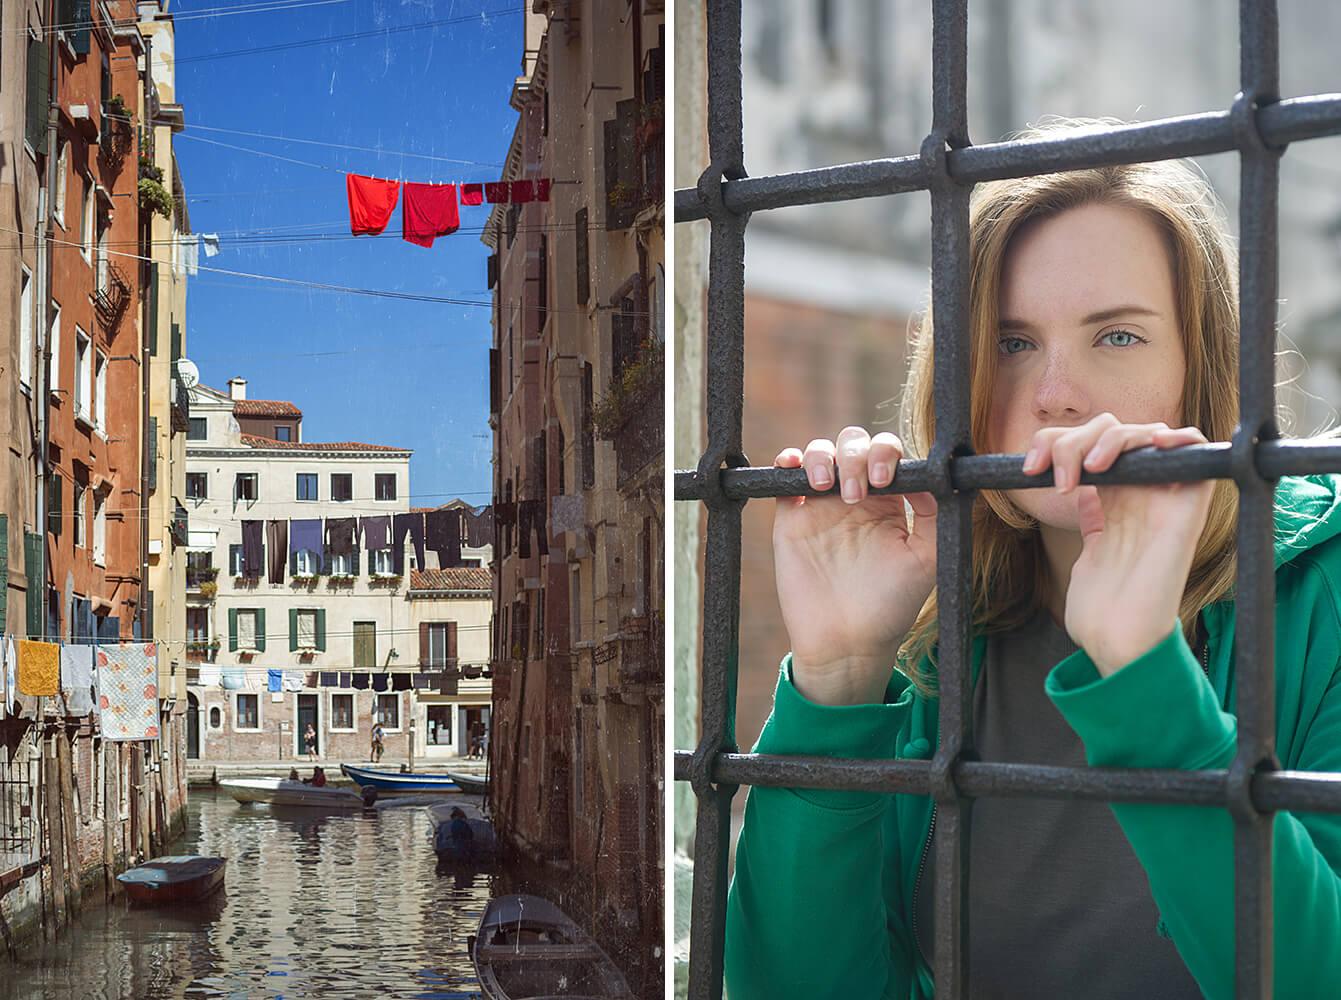 venedig, venice, venezia, italien, reise, stadt, portrait, photography, ursula schmitz